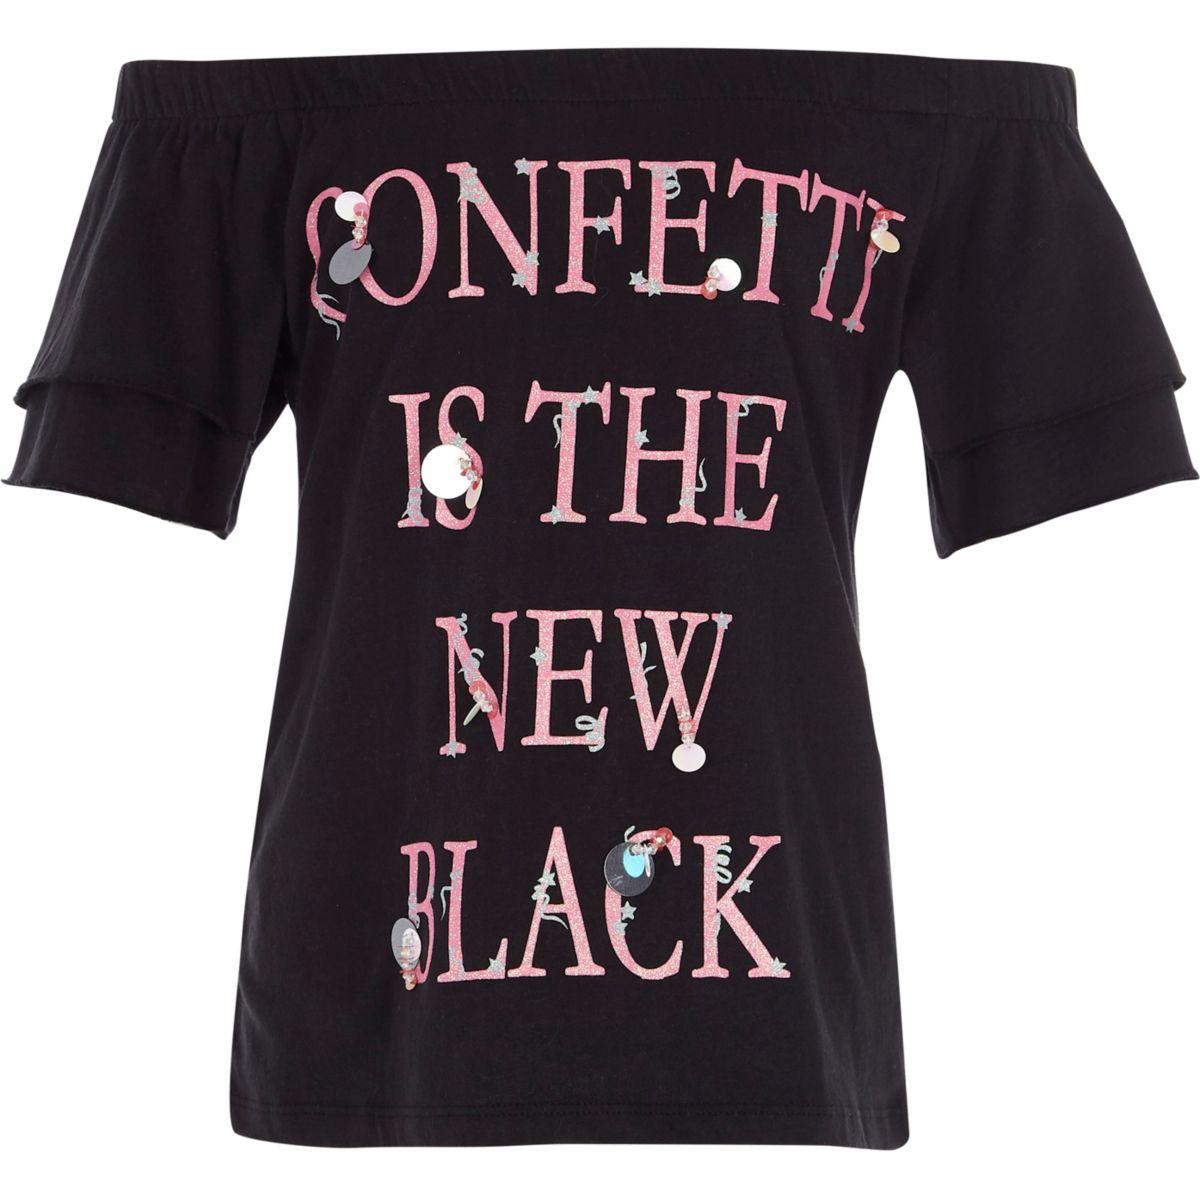 Girls black 'confetti' sequin bardot top